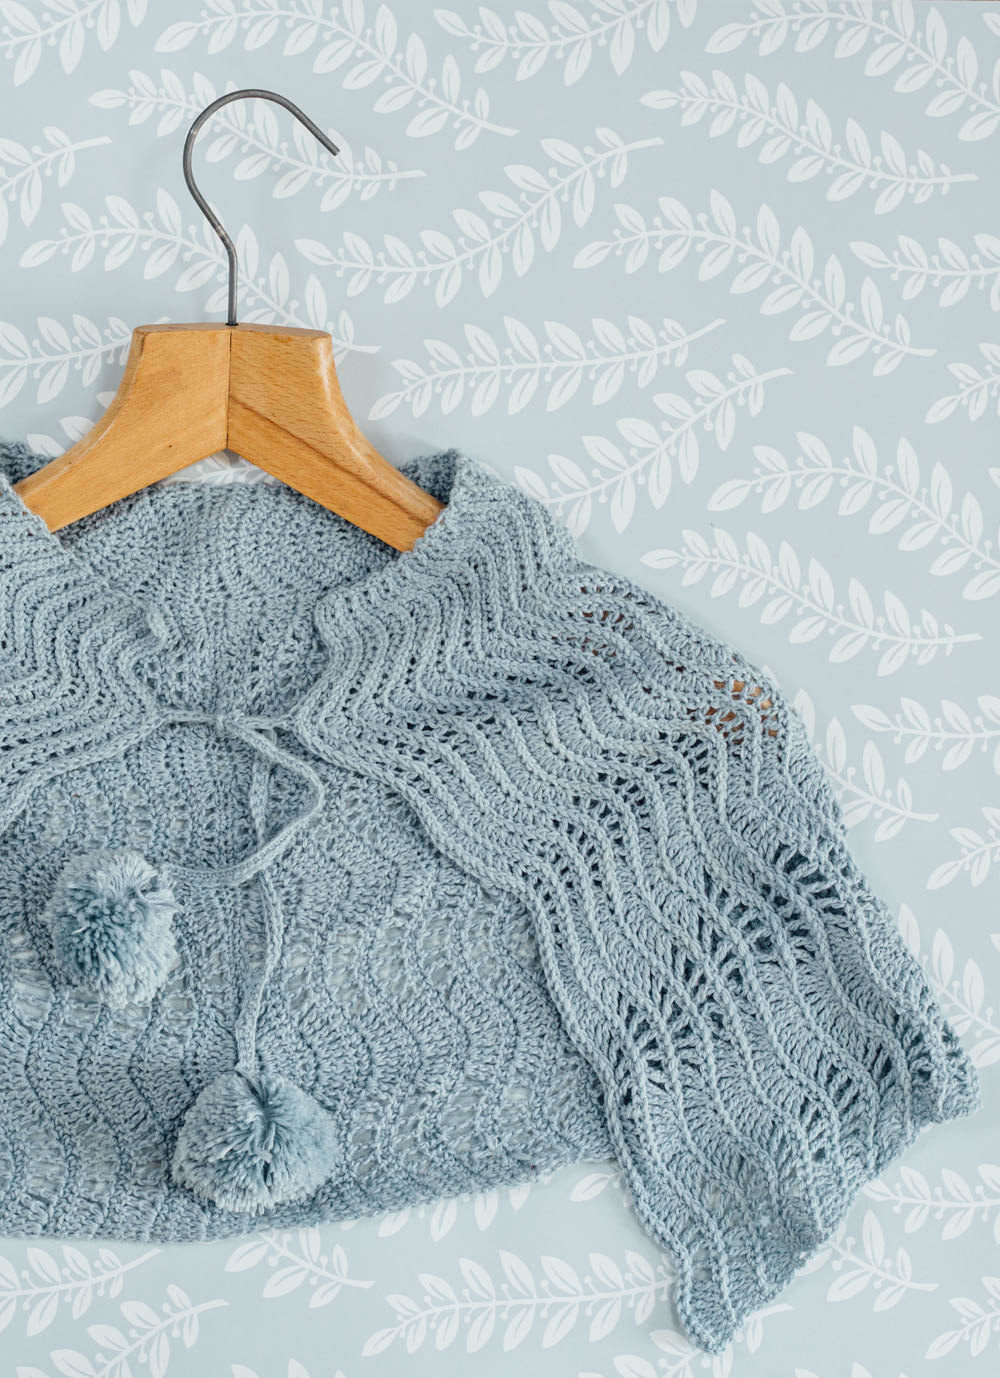 iced gem crochet pattern by Slugs on the Refrigerator